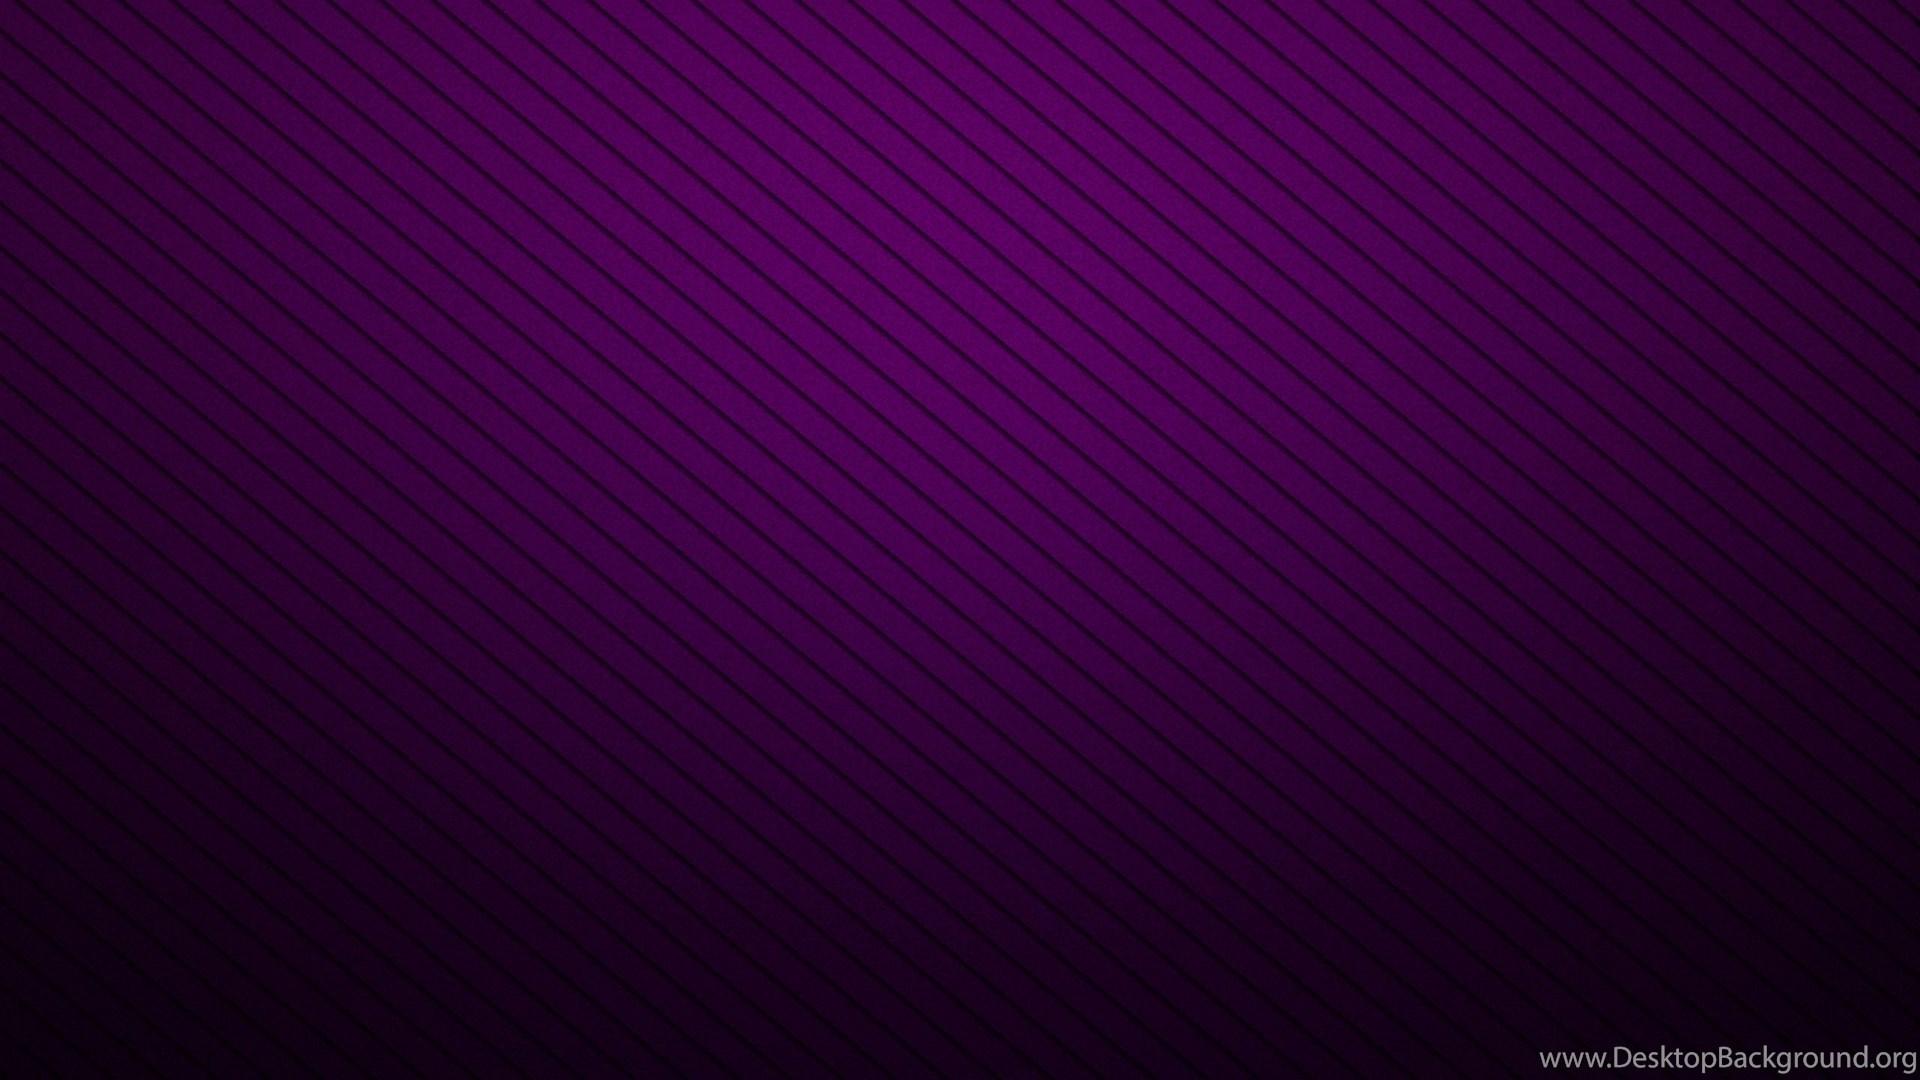 2560x1600 Texture, Background, Backgrounds, Color, Textures, Line ...  Desktop Background